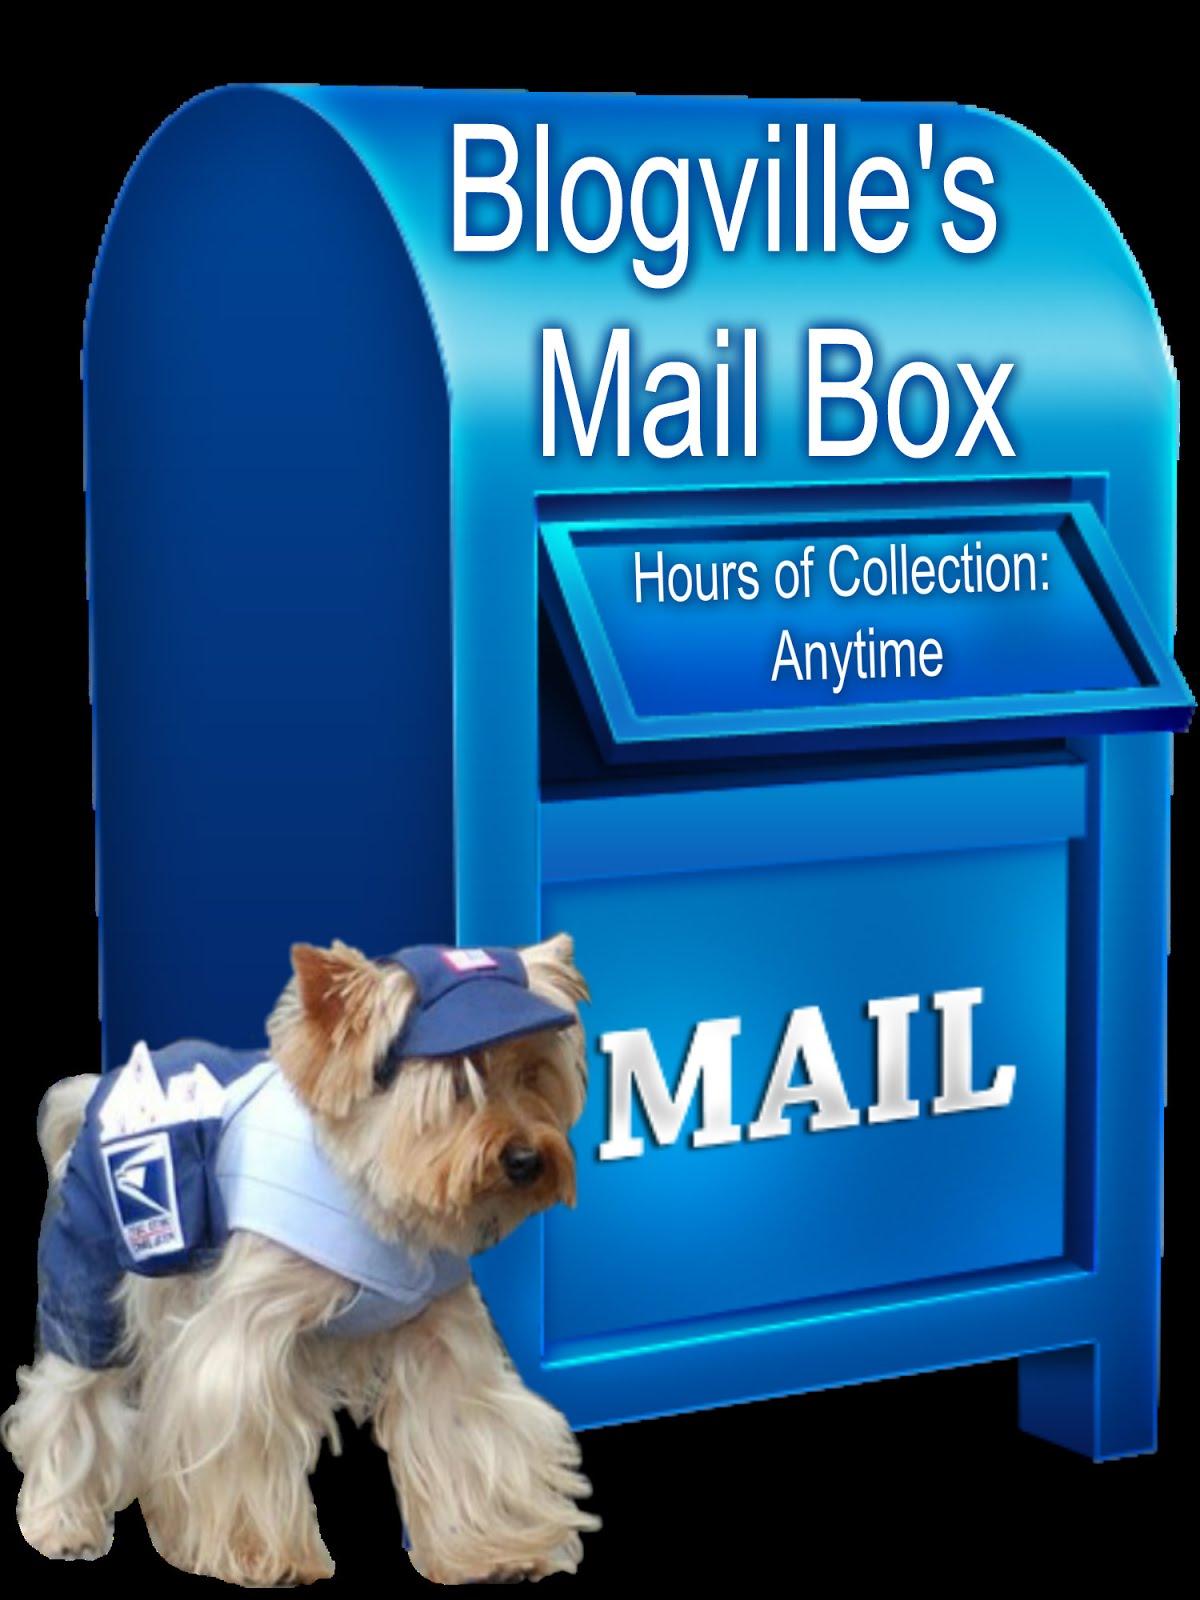 Blogville Mailbox